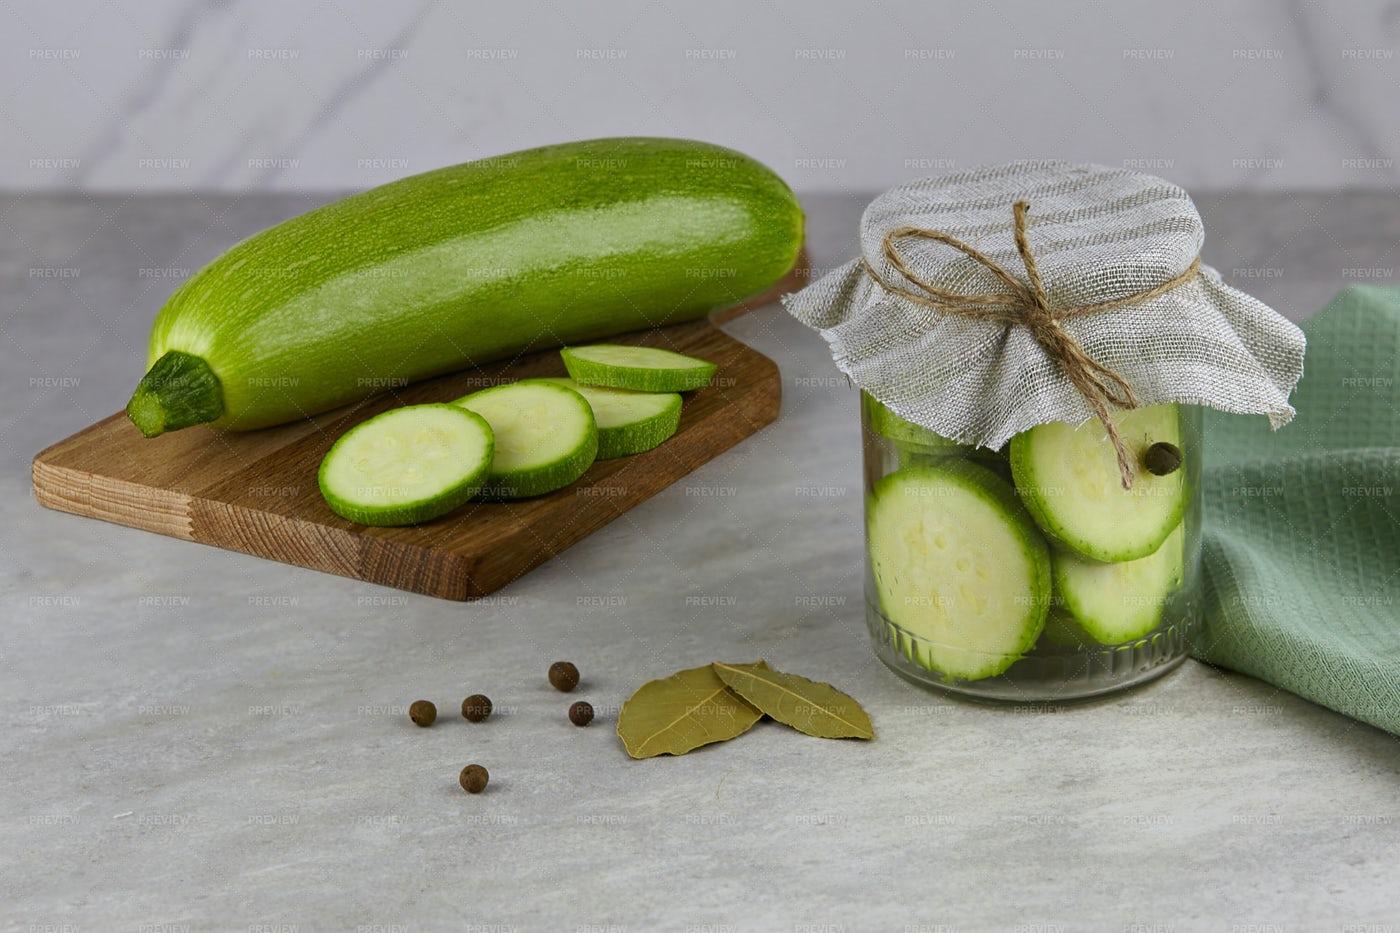 Fermented Zucchini: Stock Photos